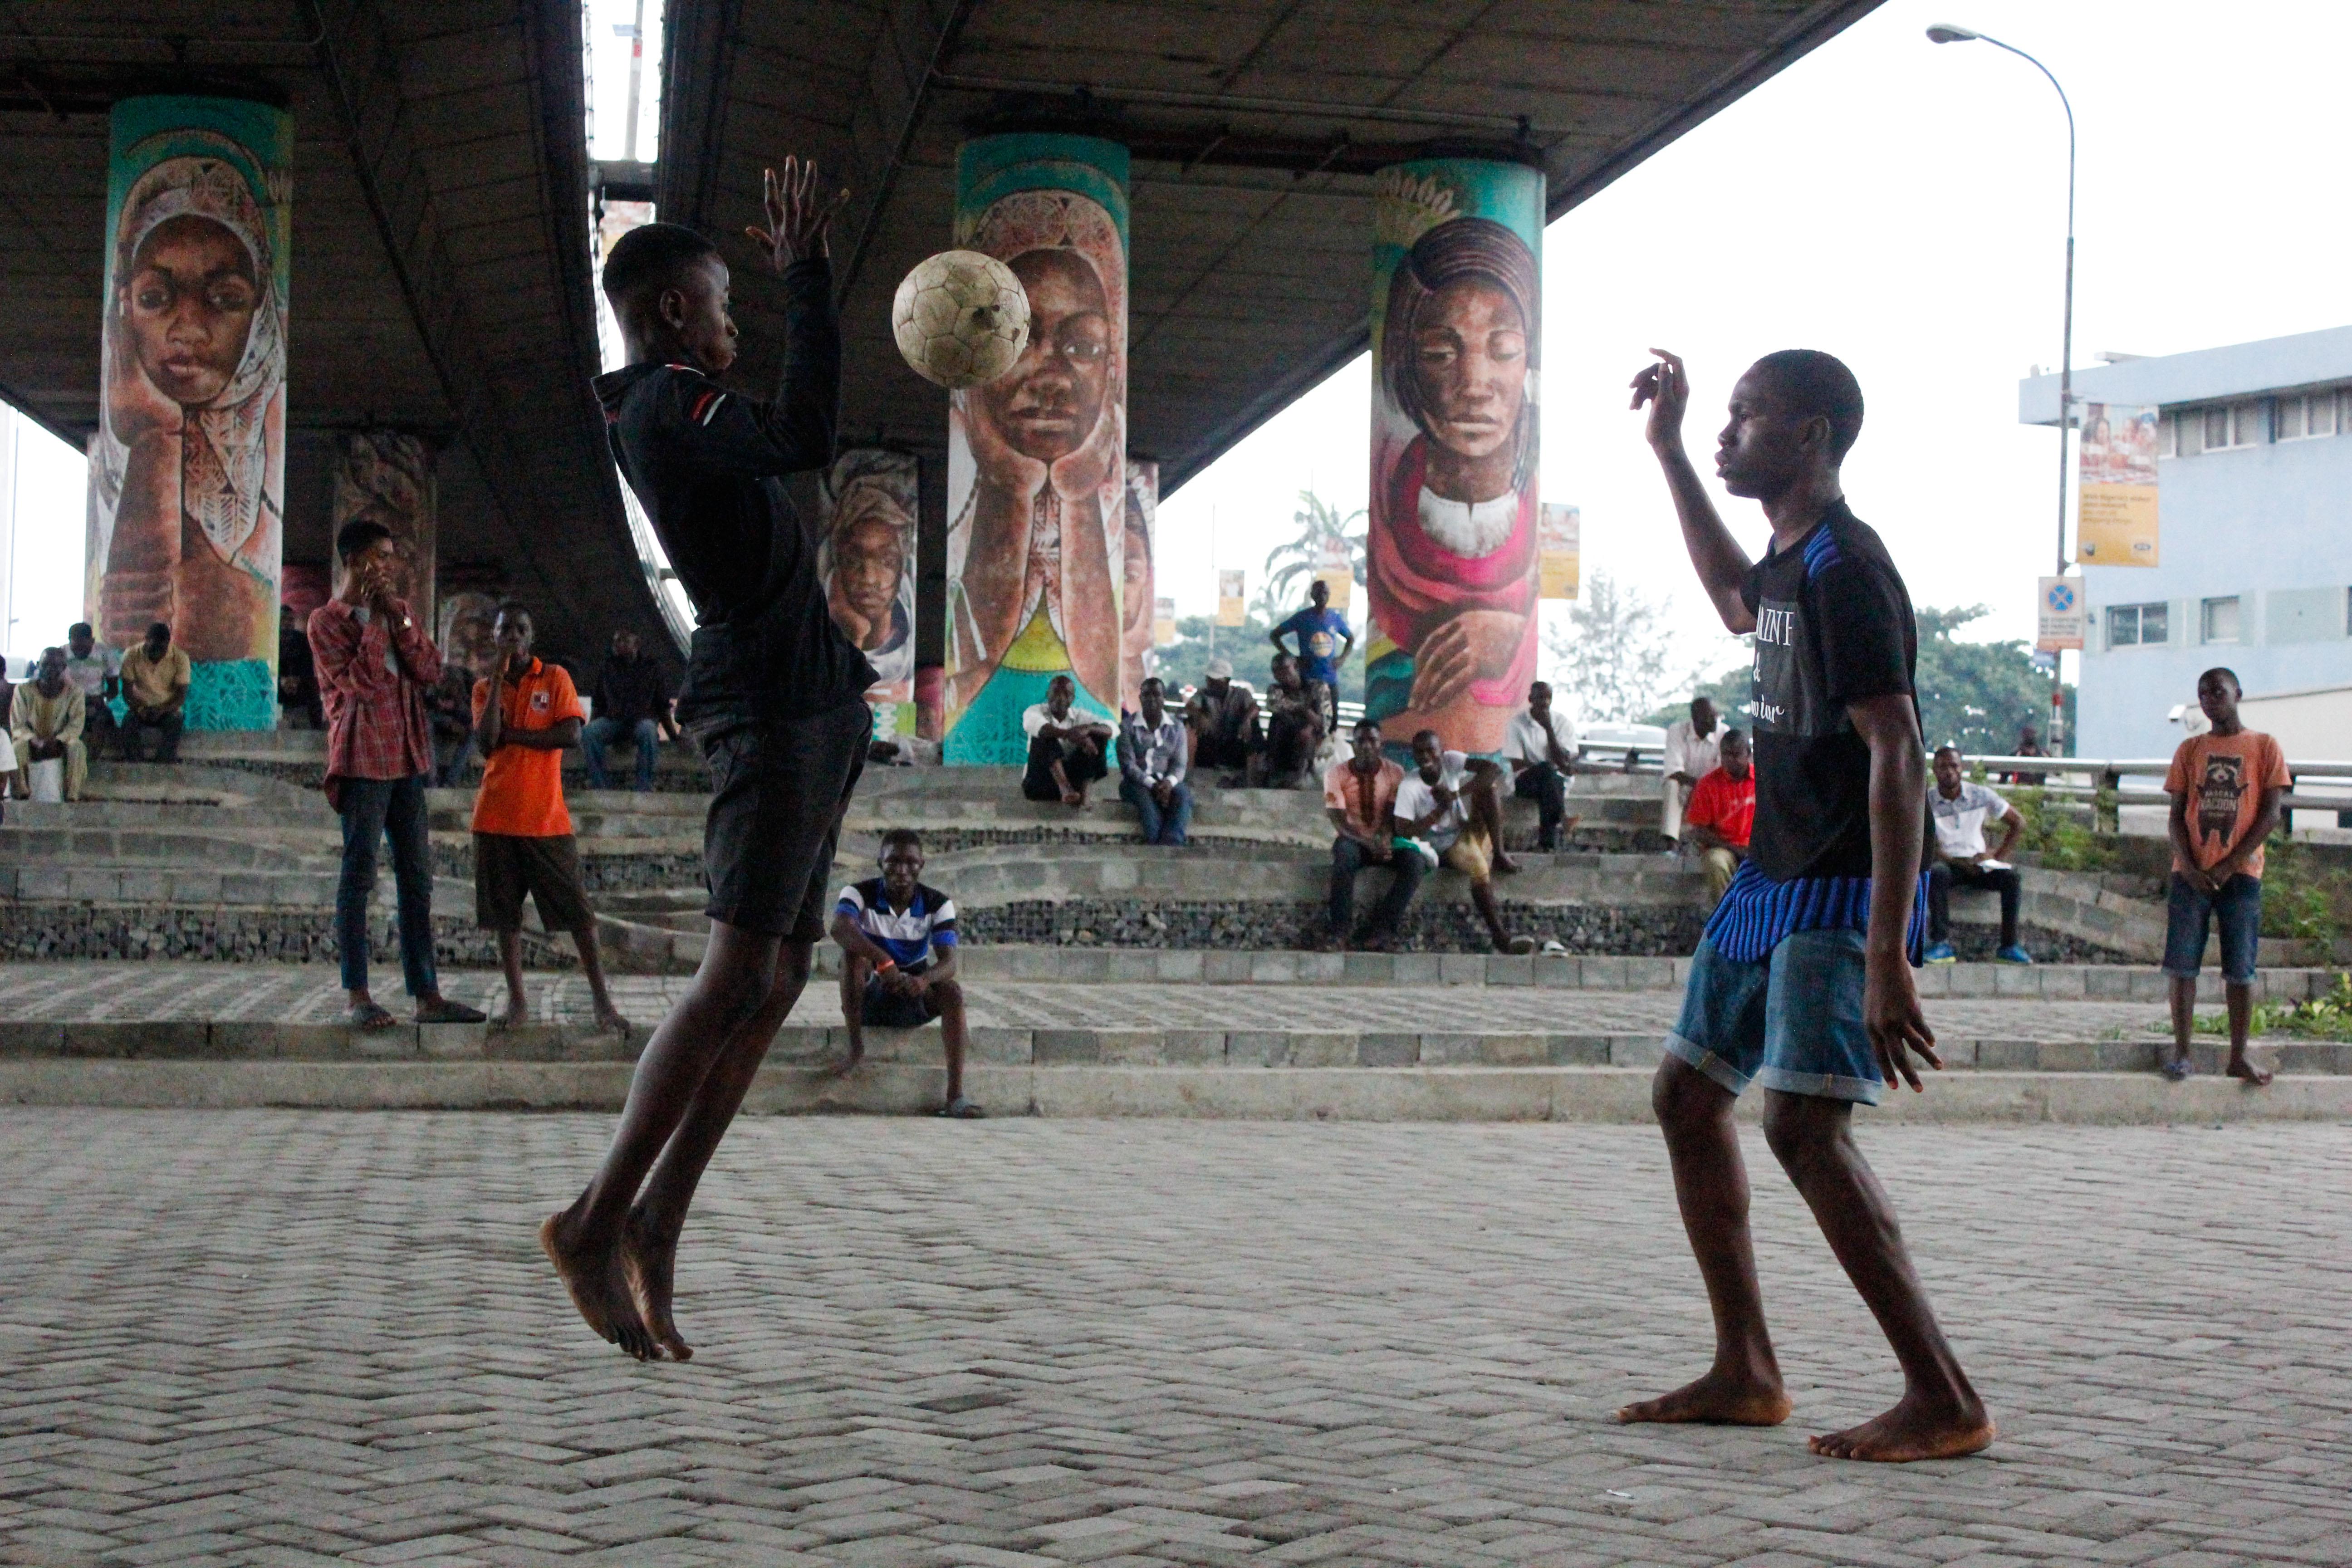 © UNESCO/Juventus - Orji Favour Chisom (Nigeria) - One Goal